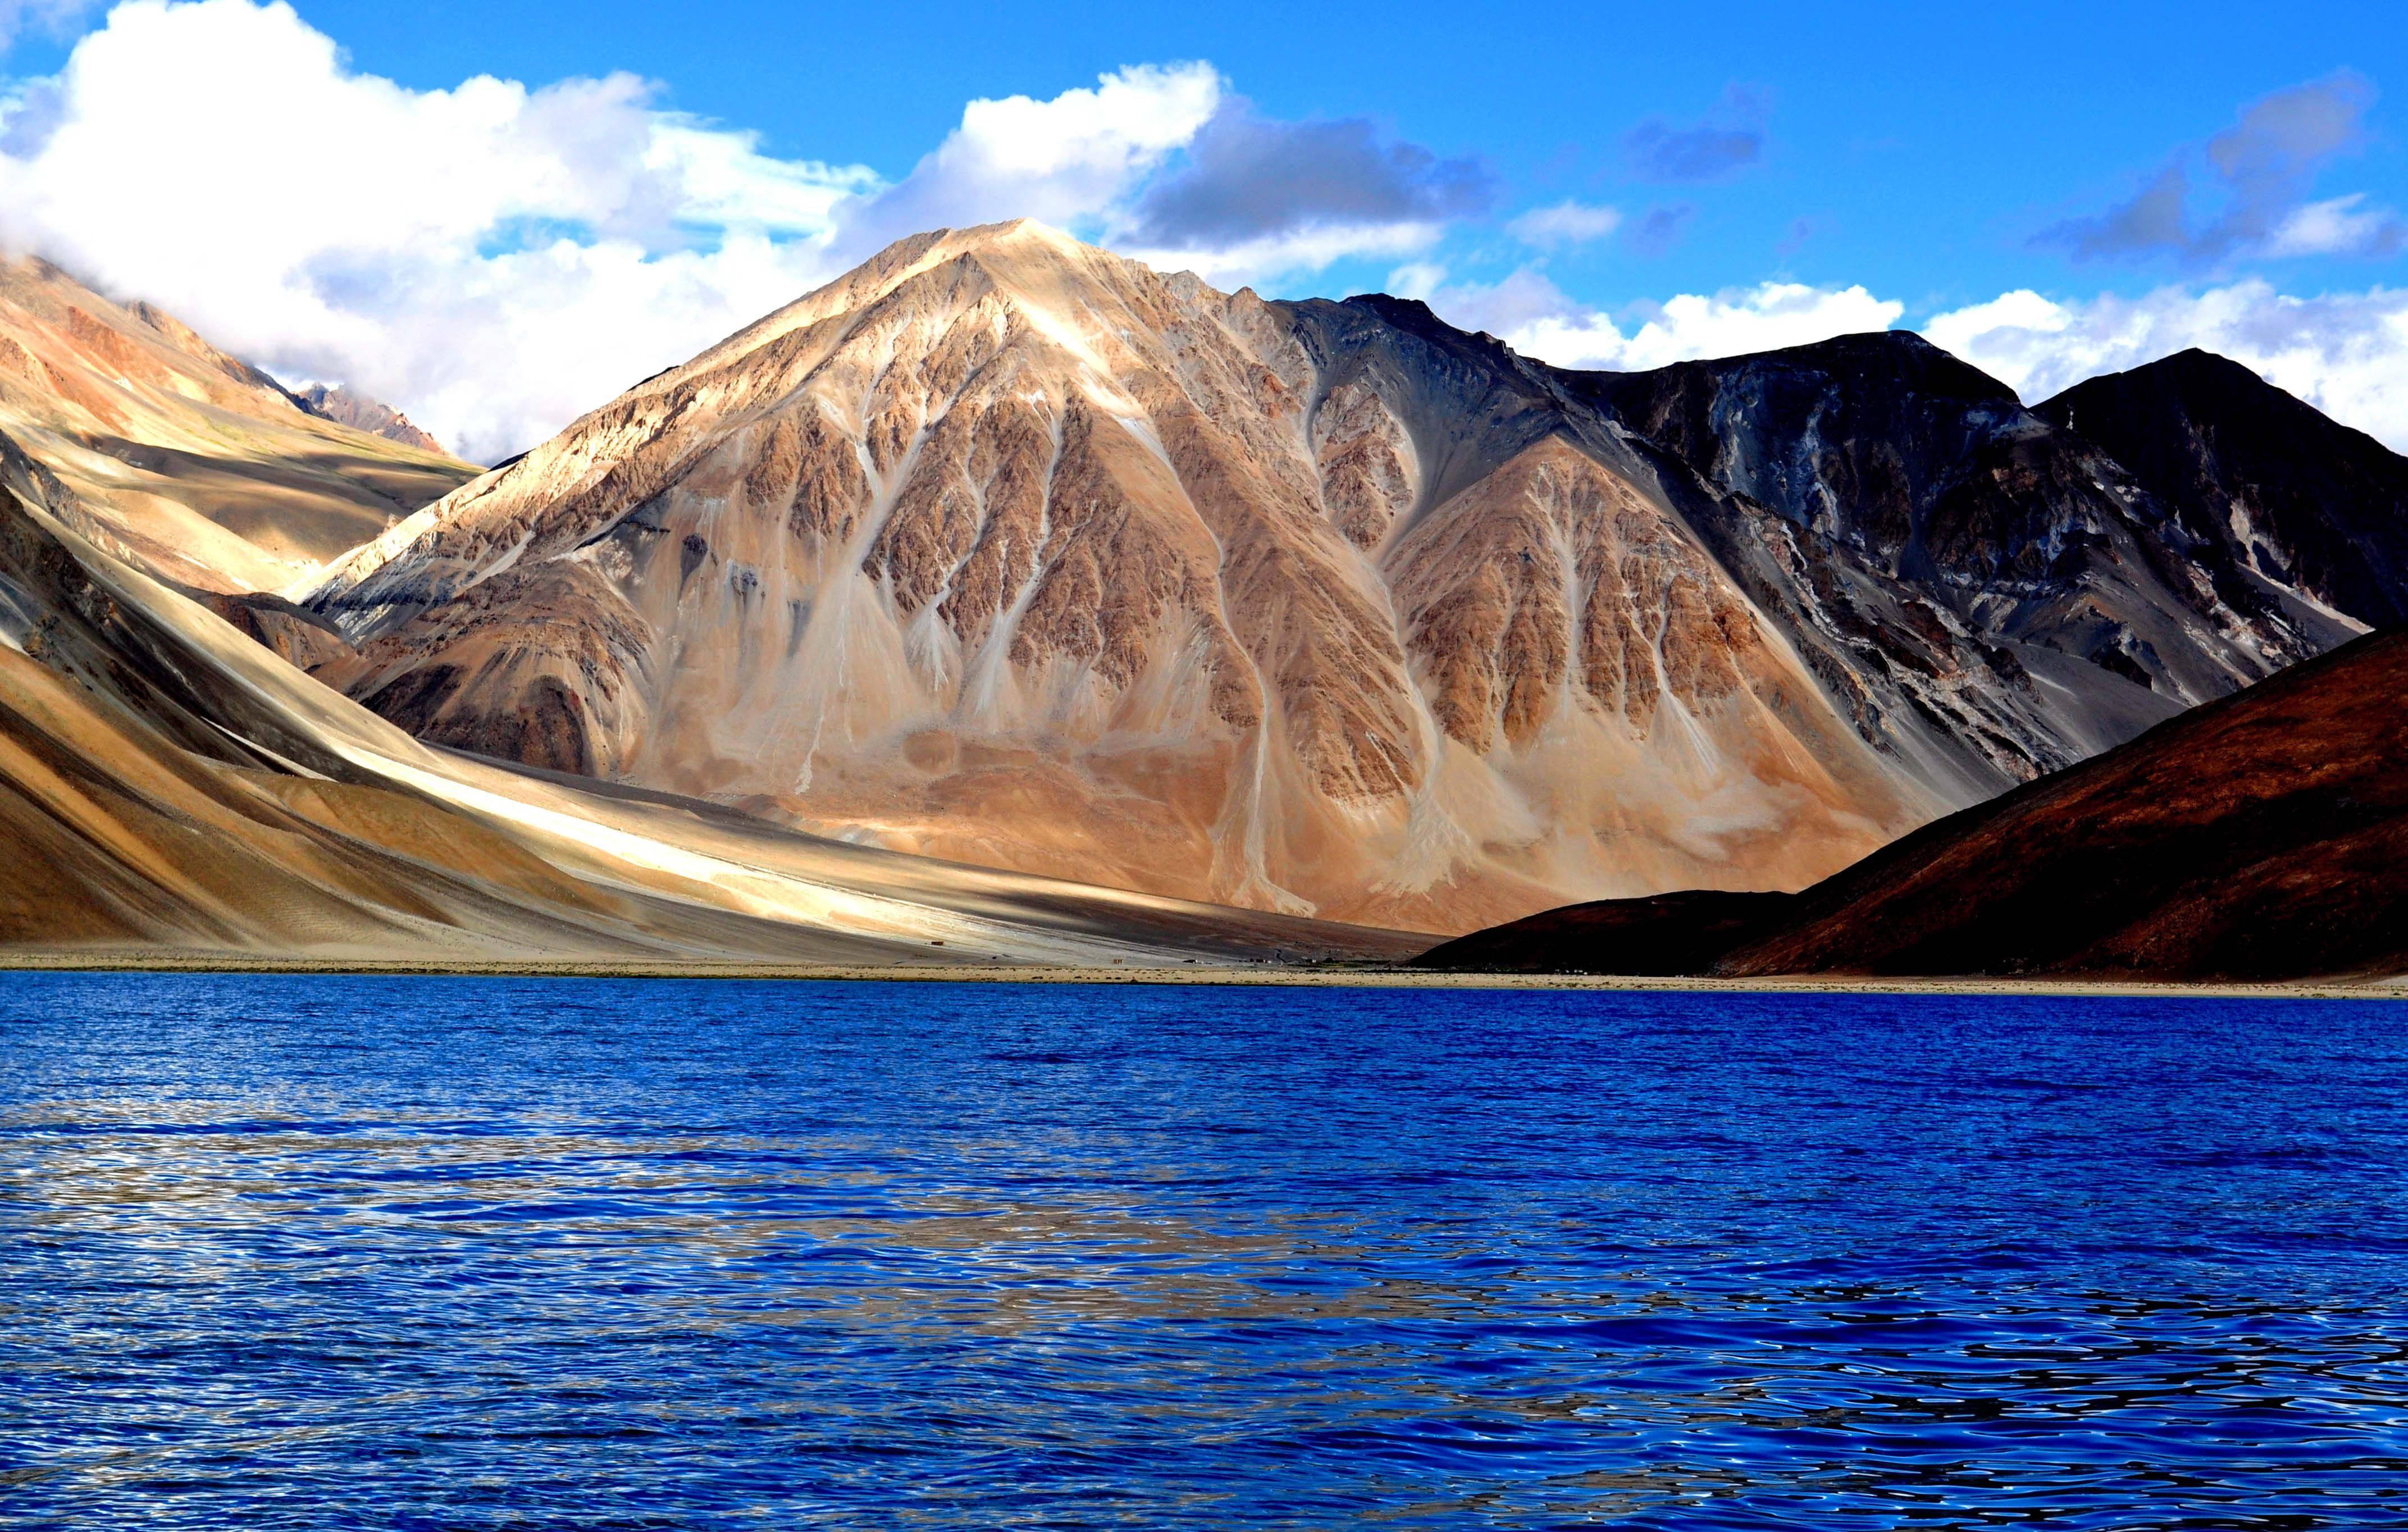 jammu kashmir pangong lake beautiful pictures full hd | wallpapers